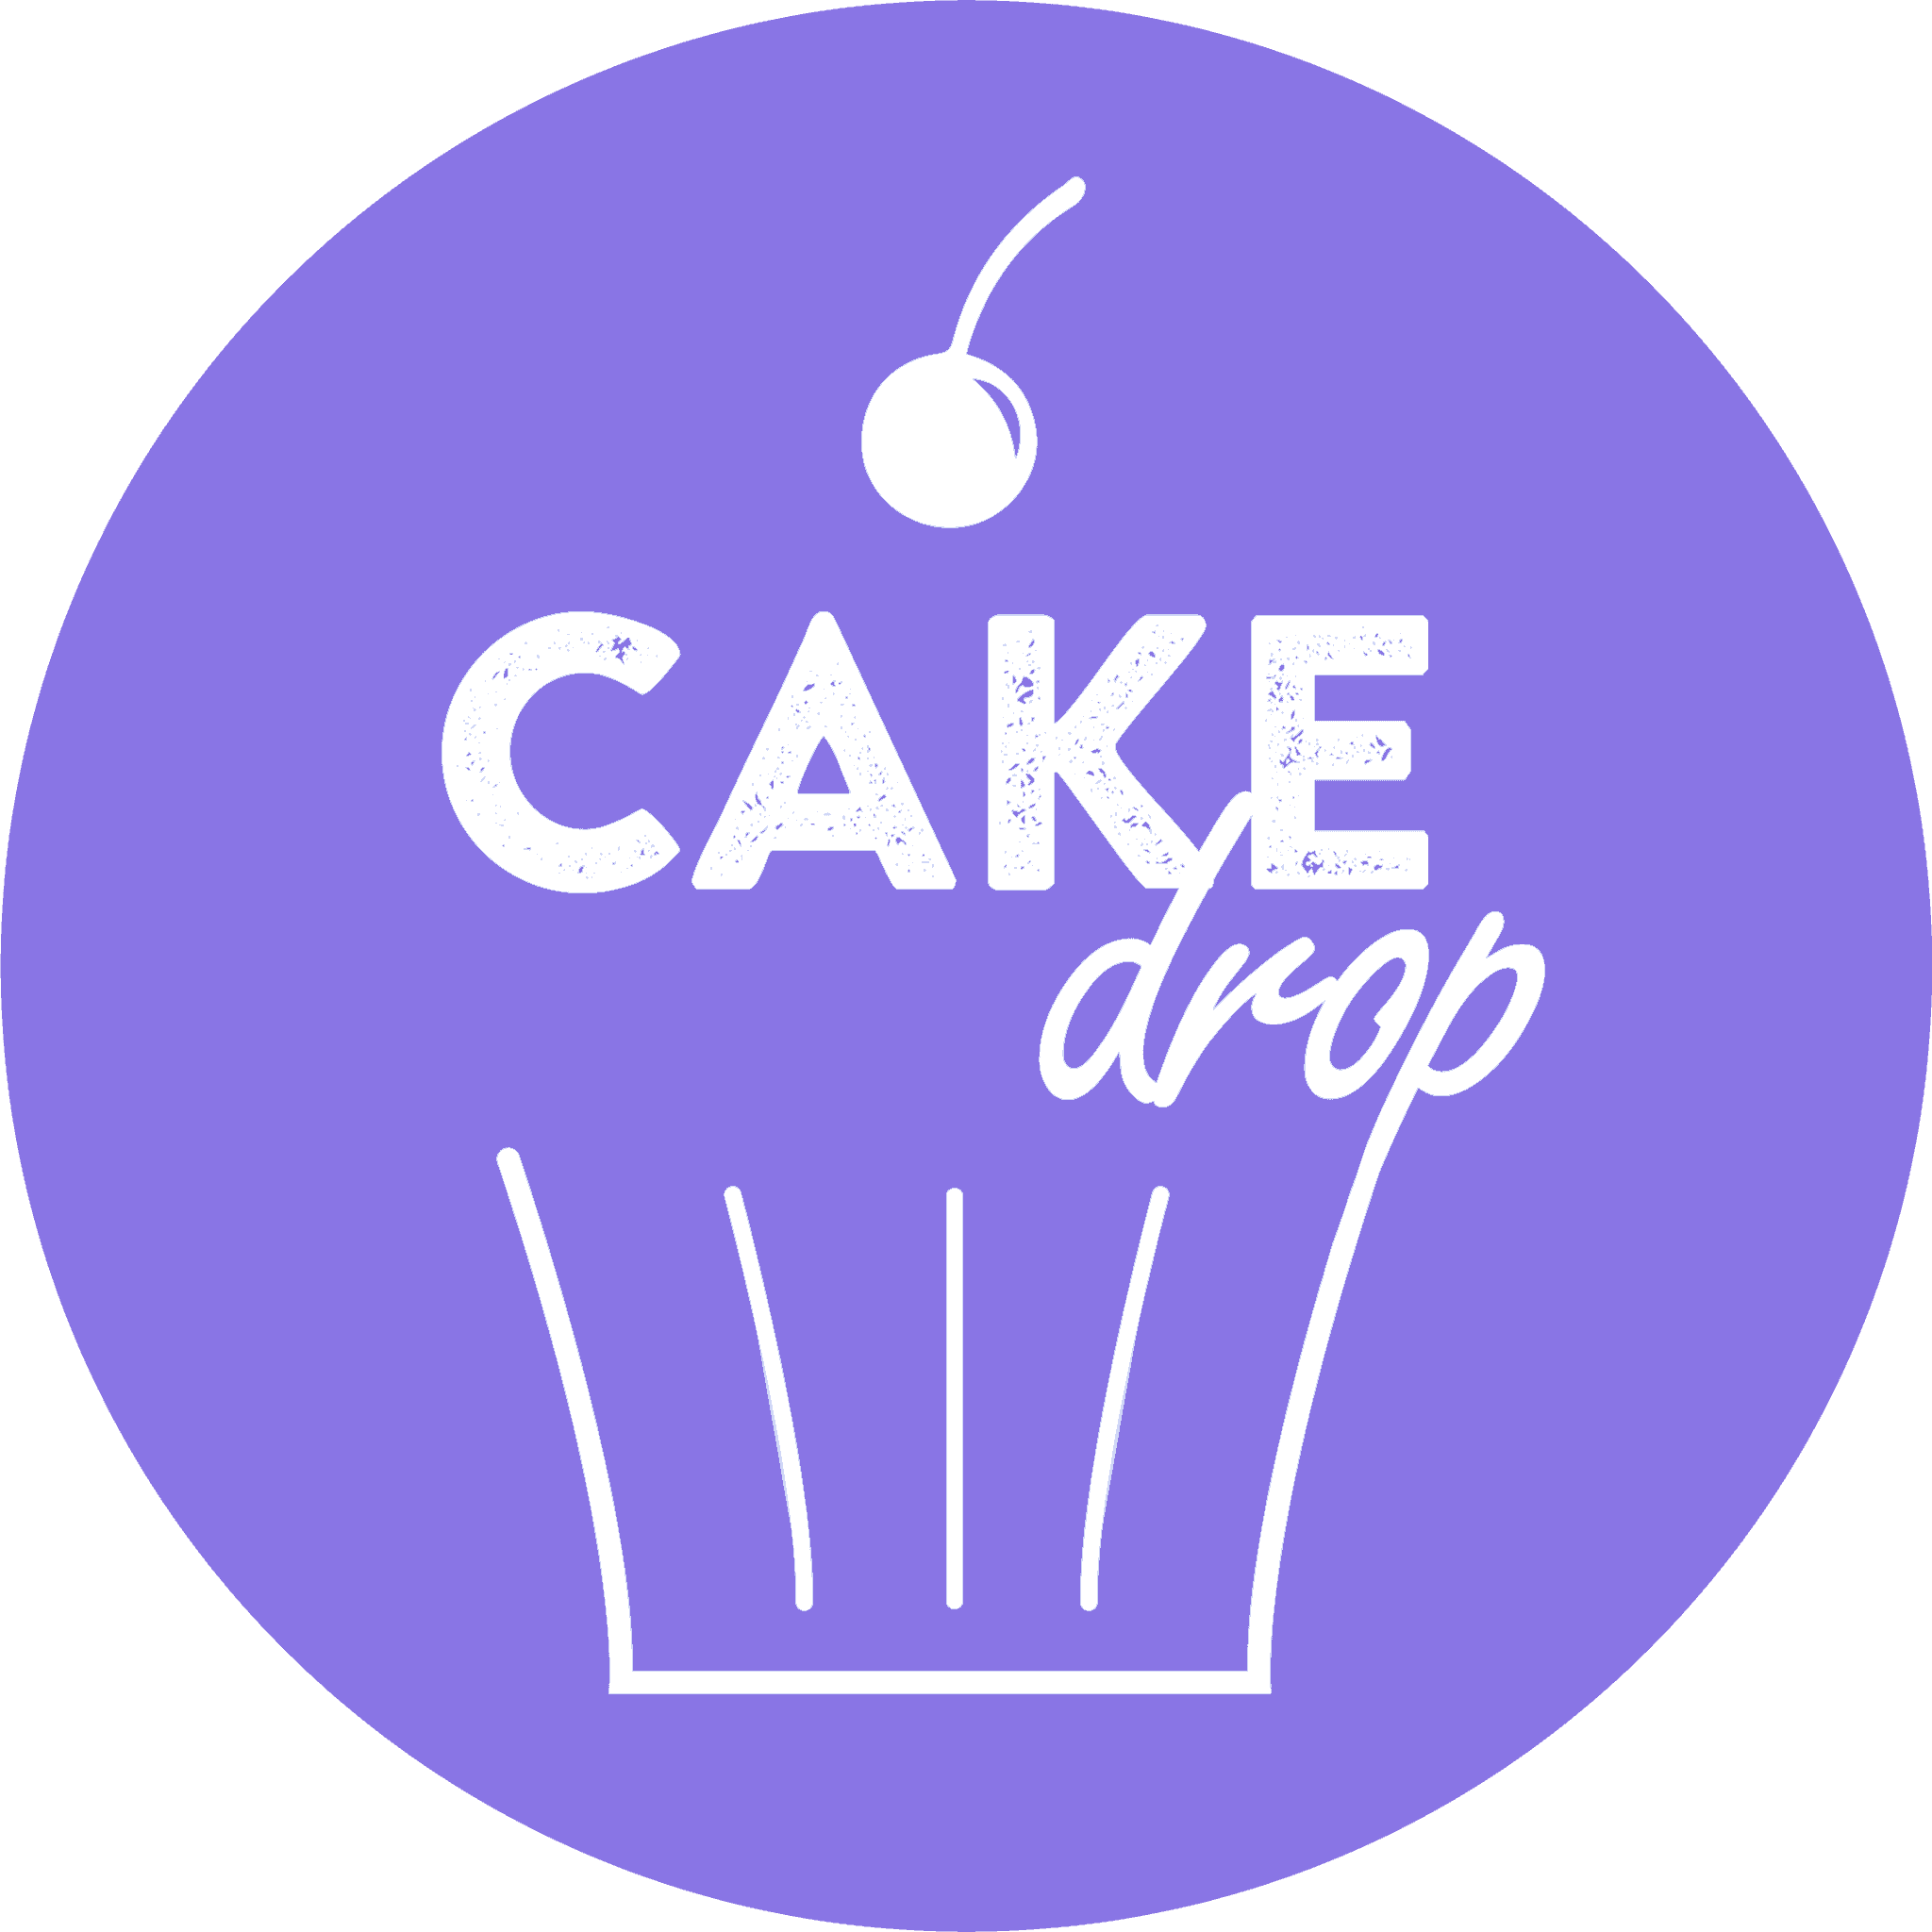 CakeDrop